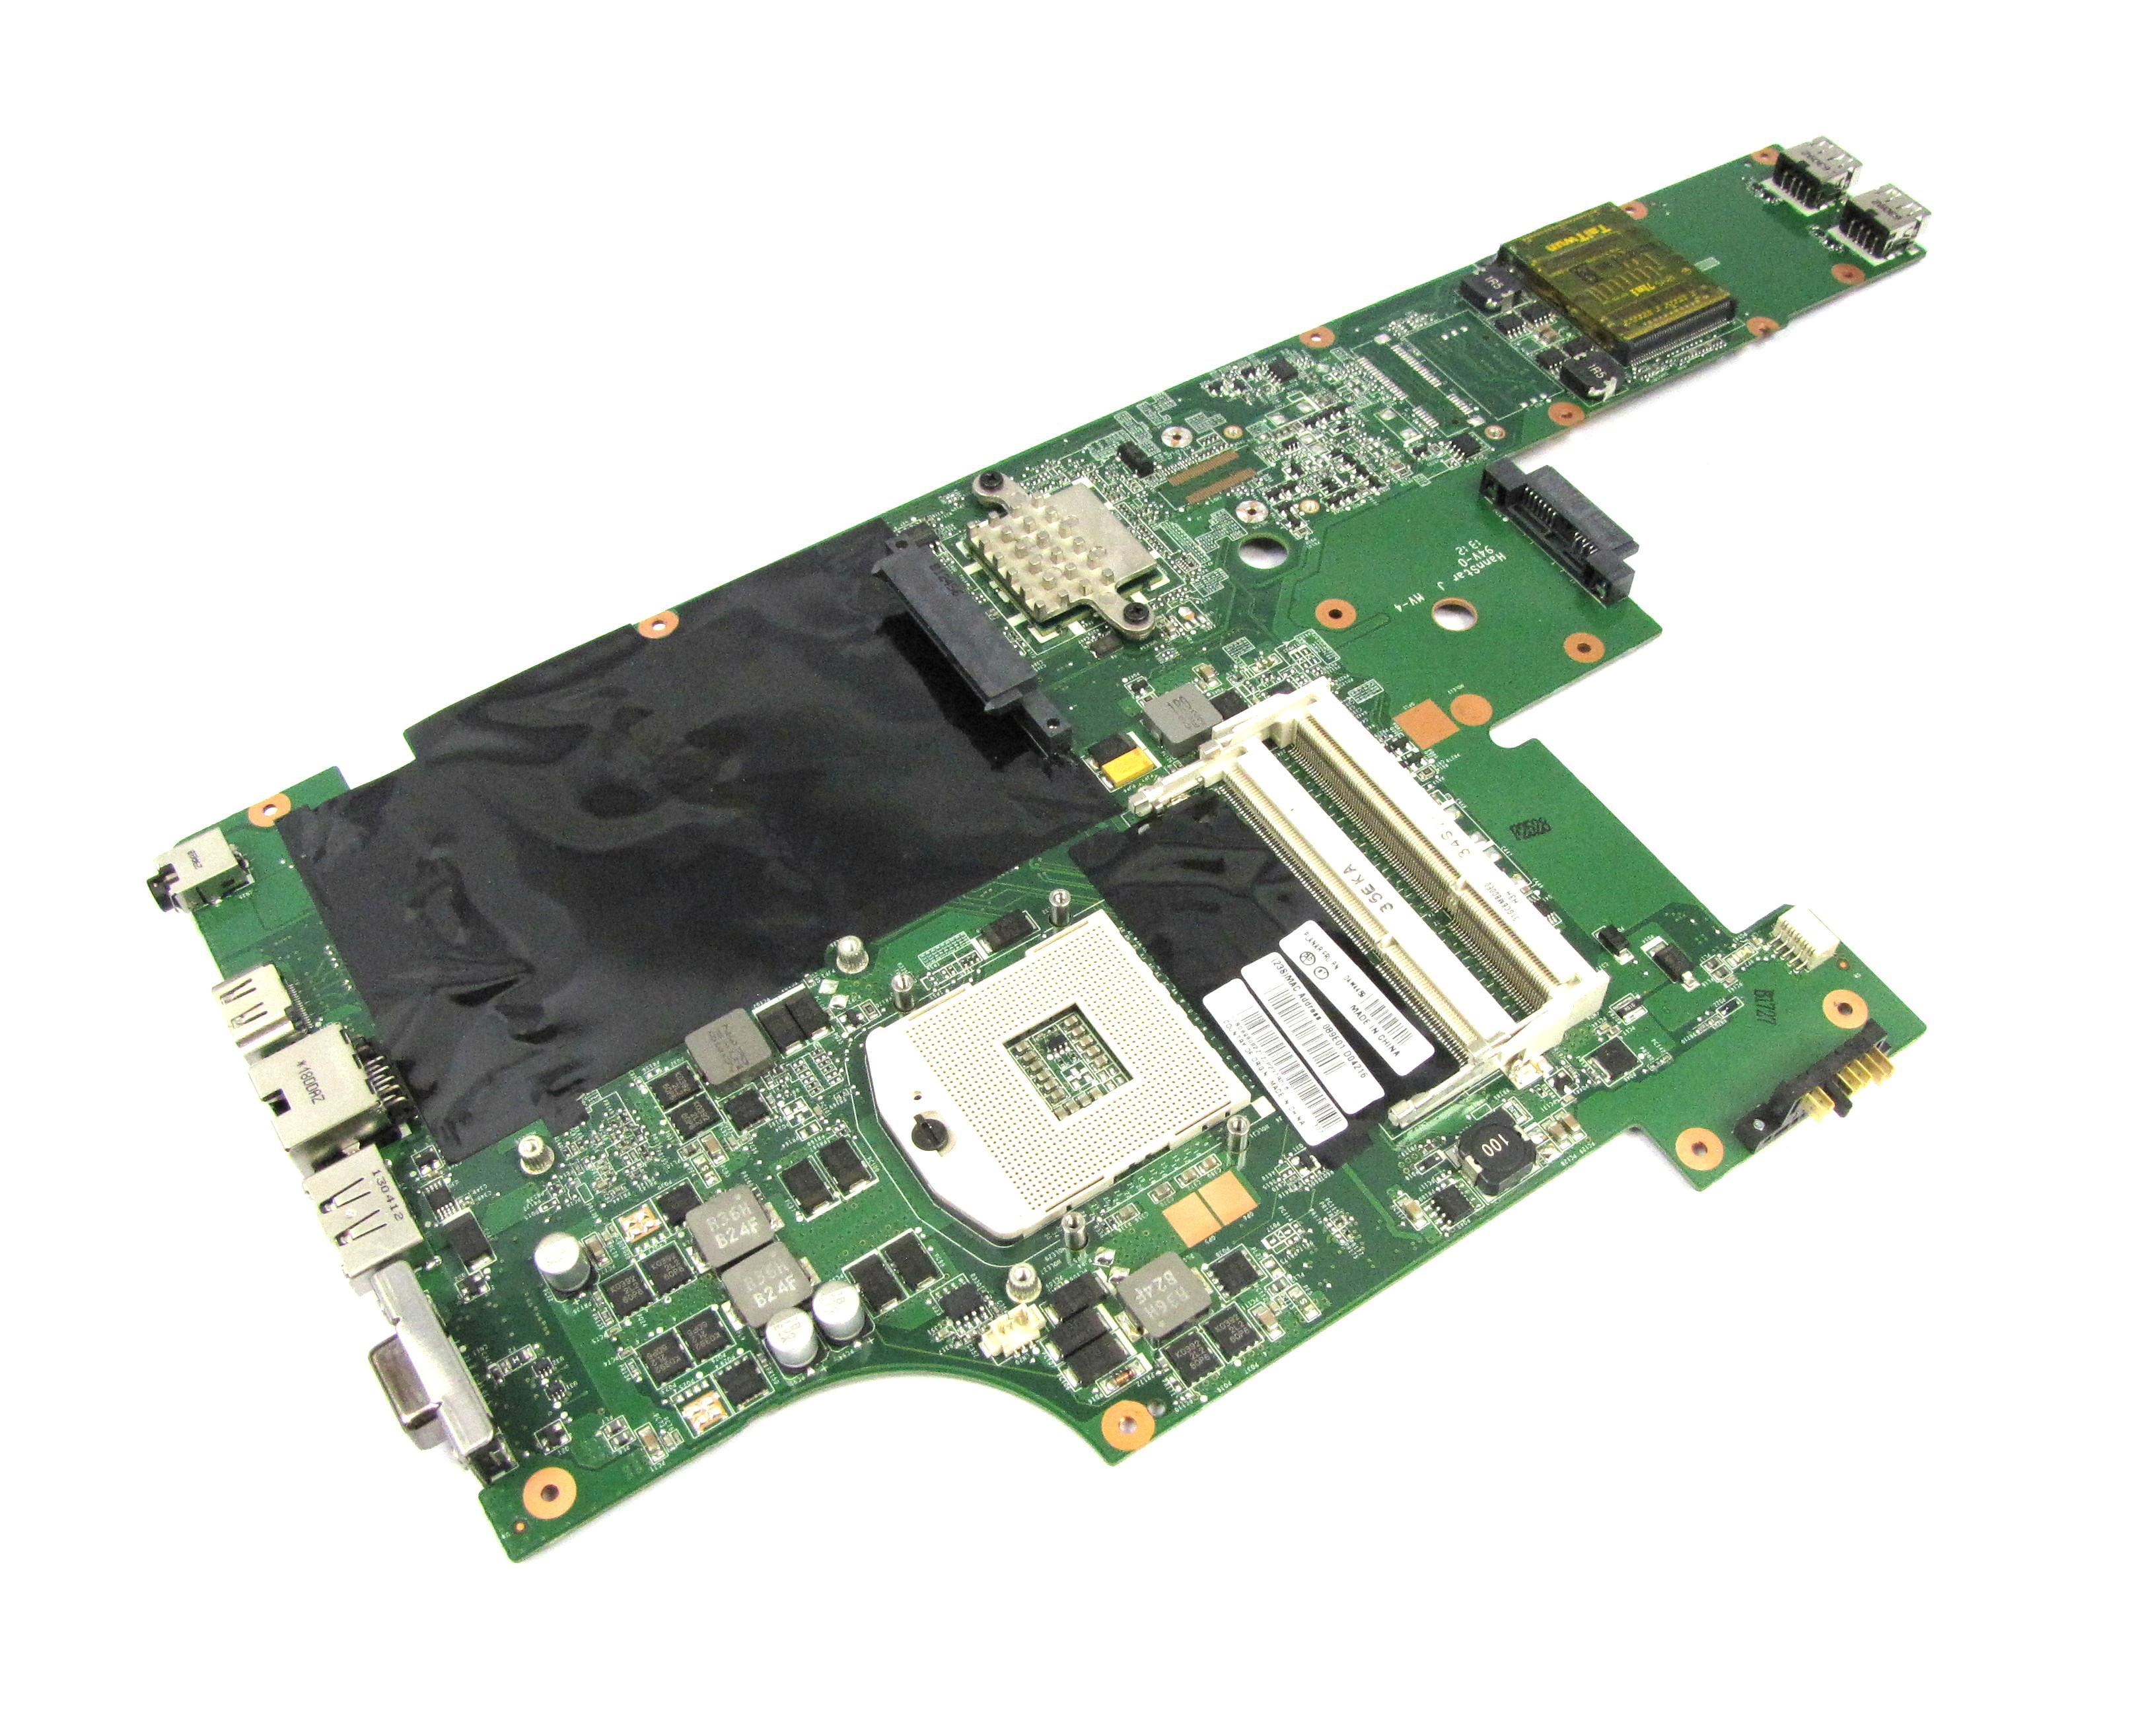 Lenovo 04W4459 ThinkPad Edge 15 Type:0301-J4G Laptop Motherboard